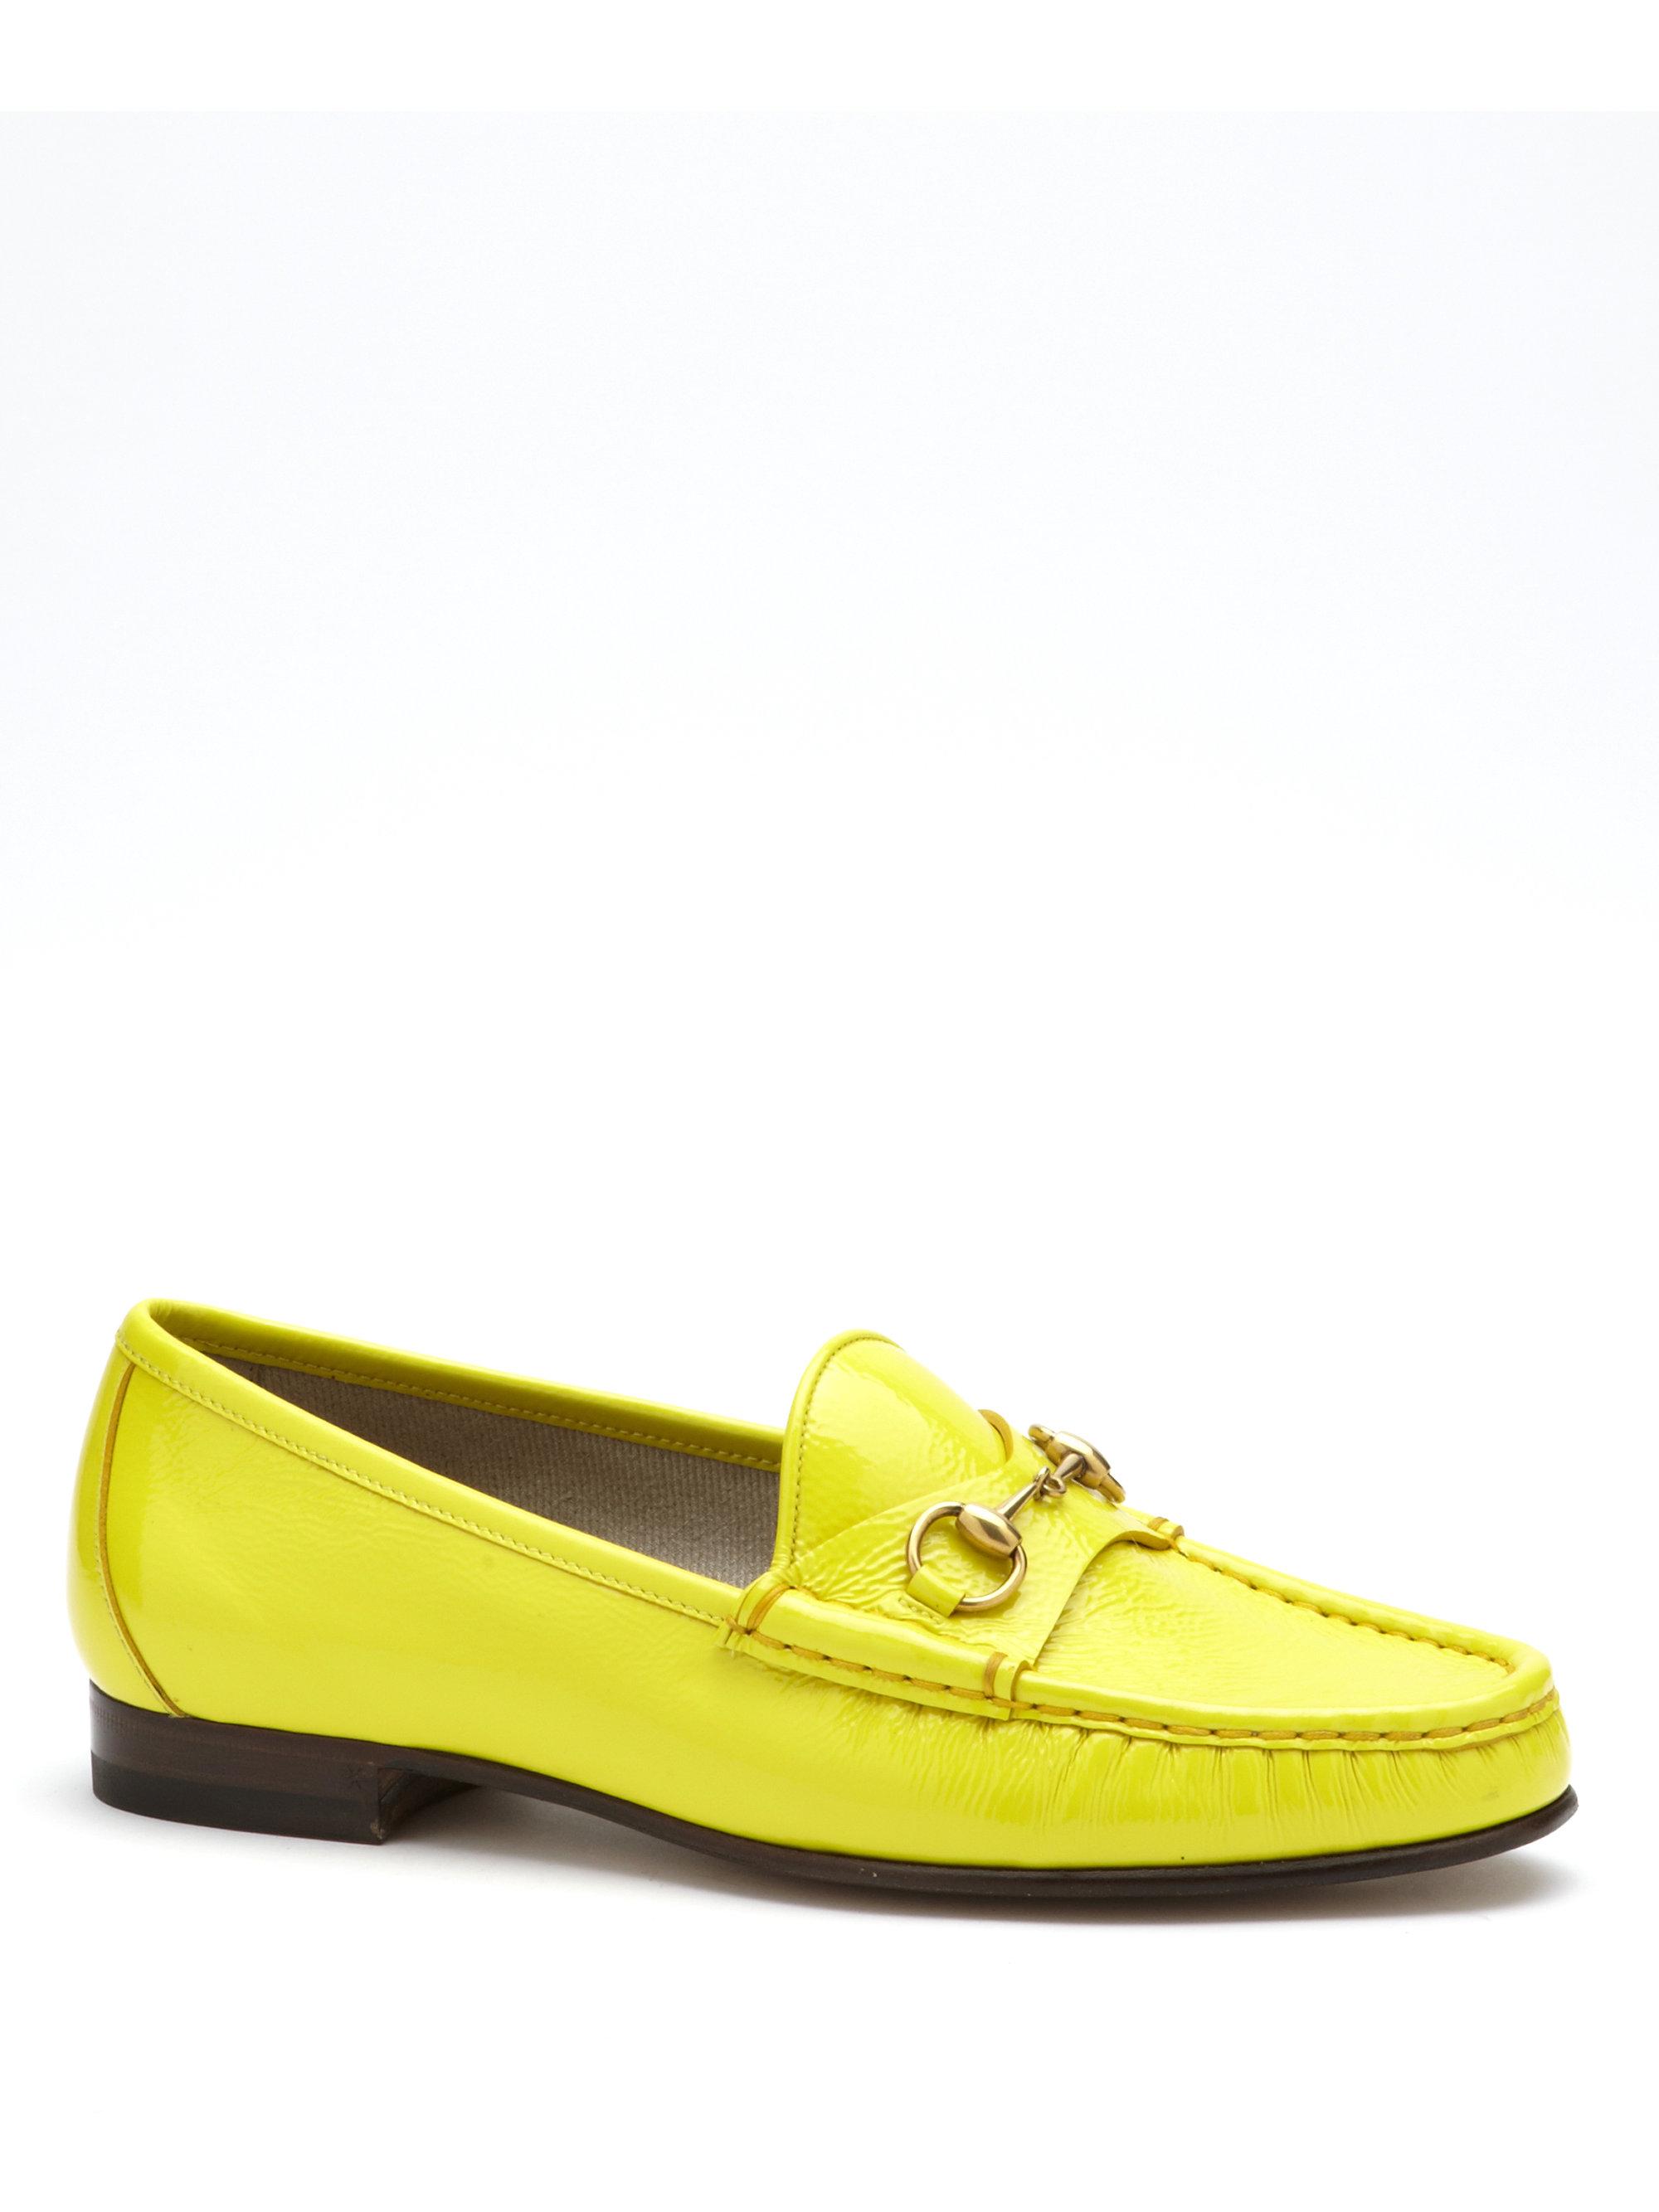 2d9dbaf85a94 Yellow Gucci Boots